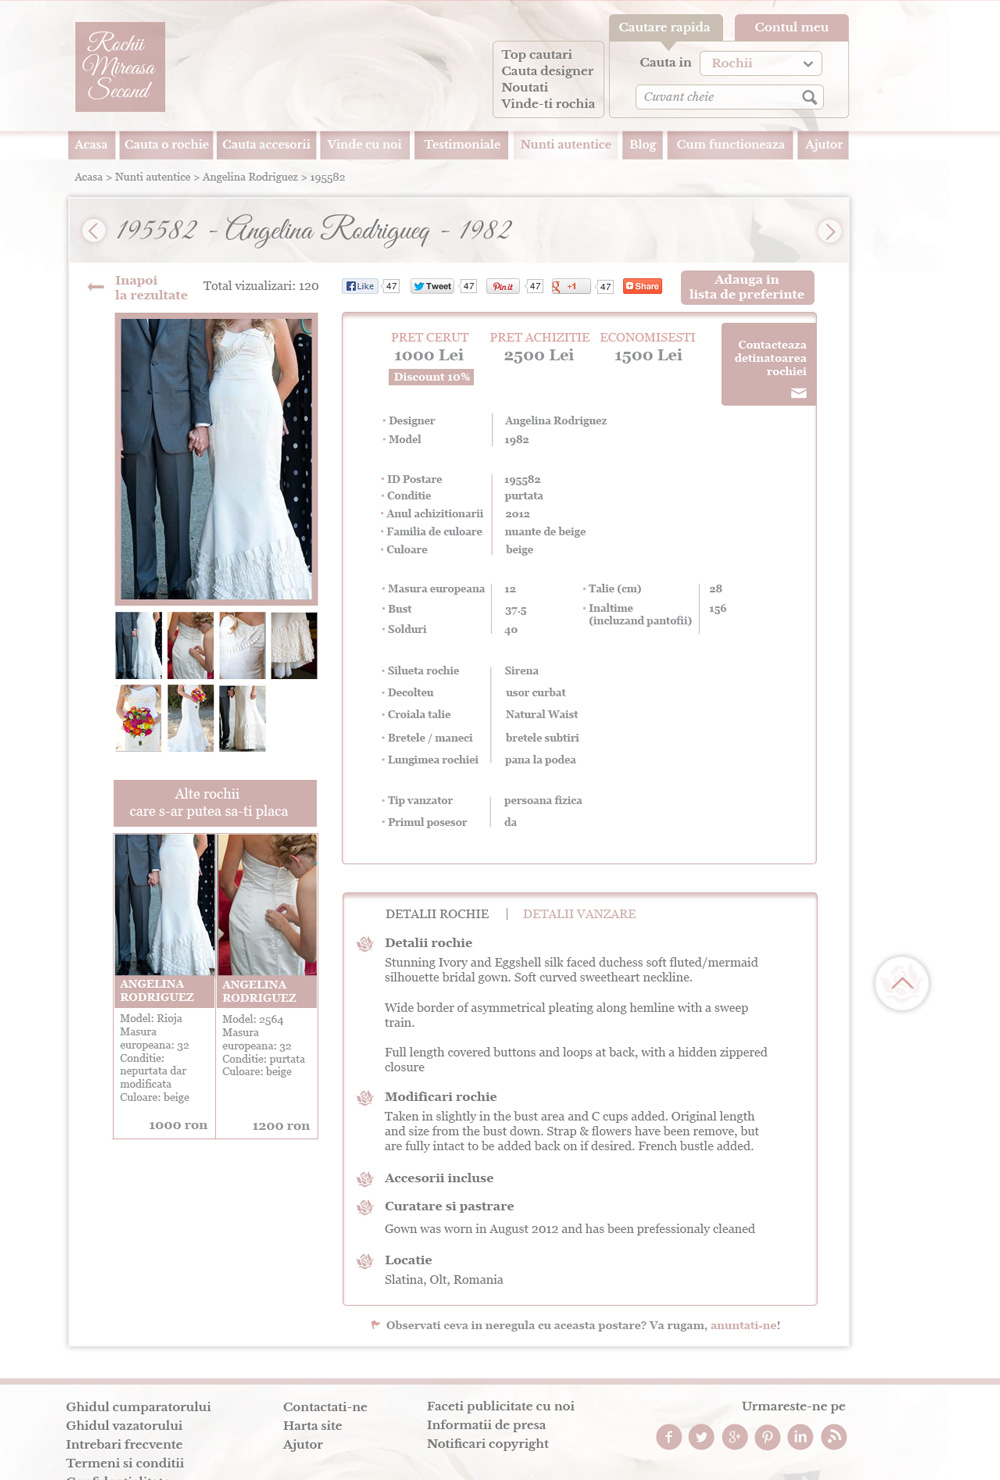 Pagina detaliu produs